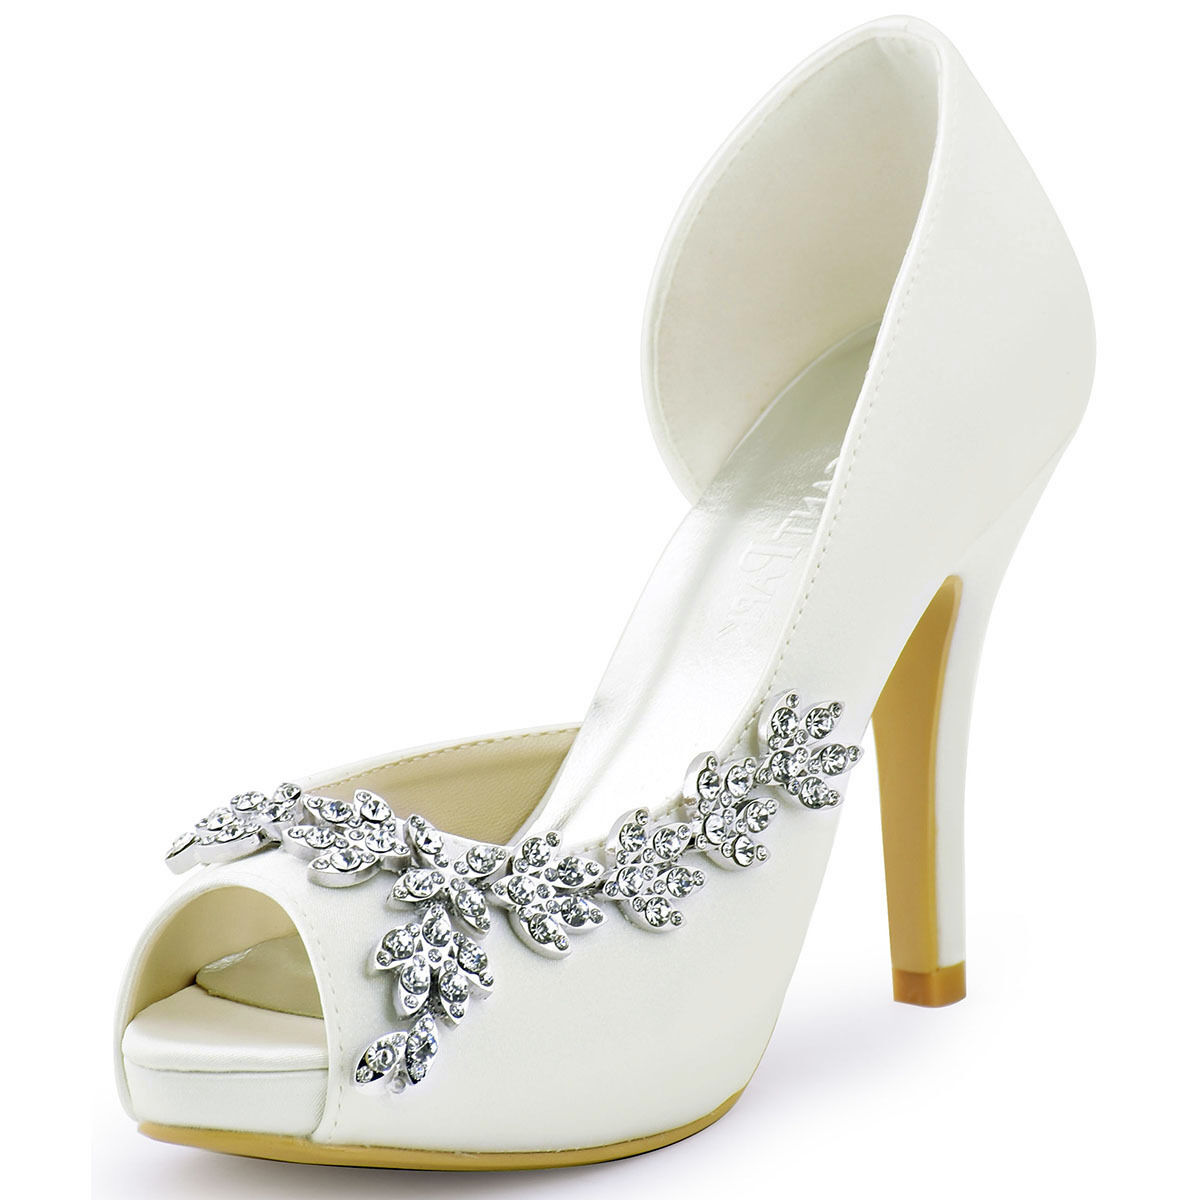 High Heels Peep Toe Rhinestones Rhinestones Rhinestones Satin Party Pumps Wedding Bridal shoes Size 4-11 01276e